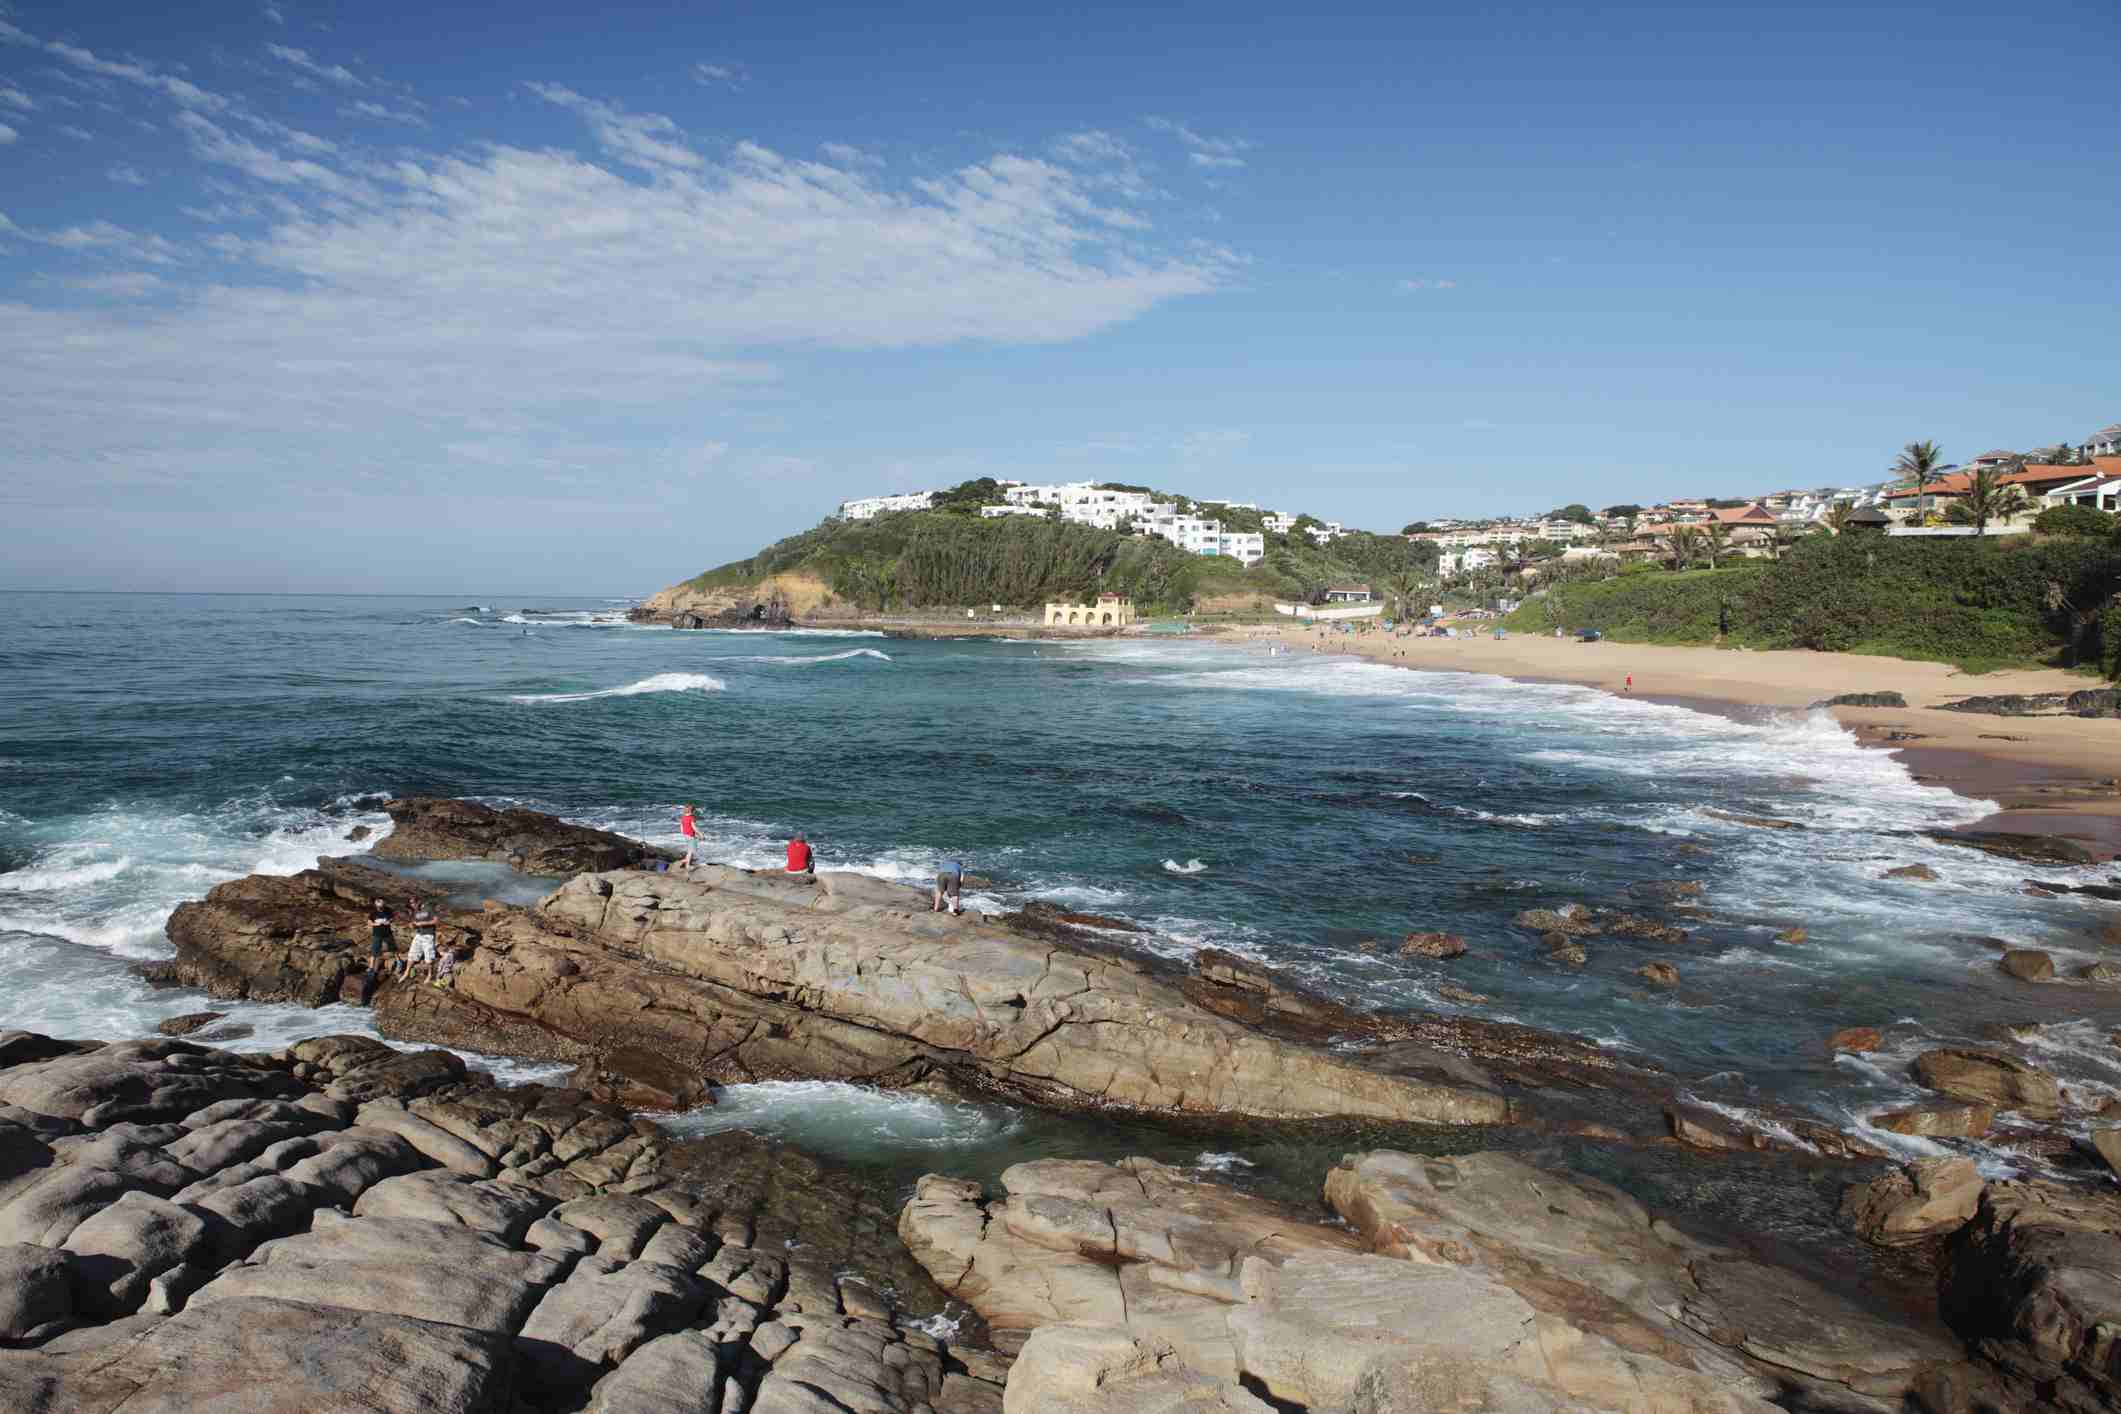 Thompson's Bay, KwaZulu-Natal